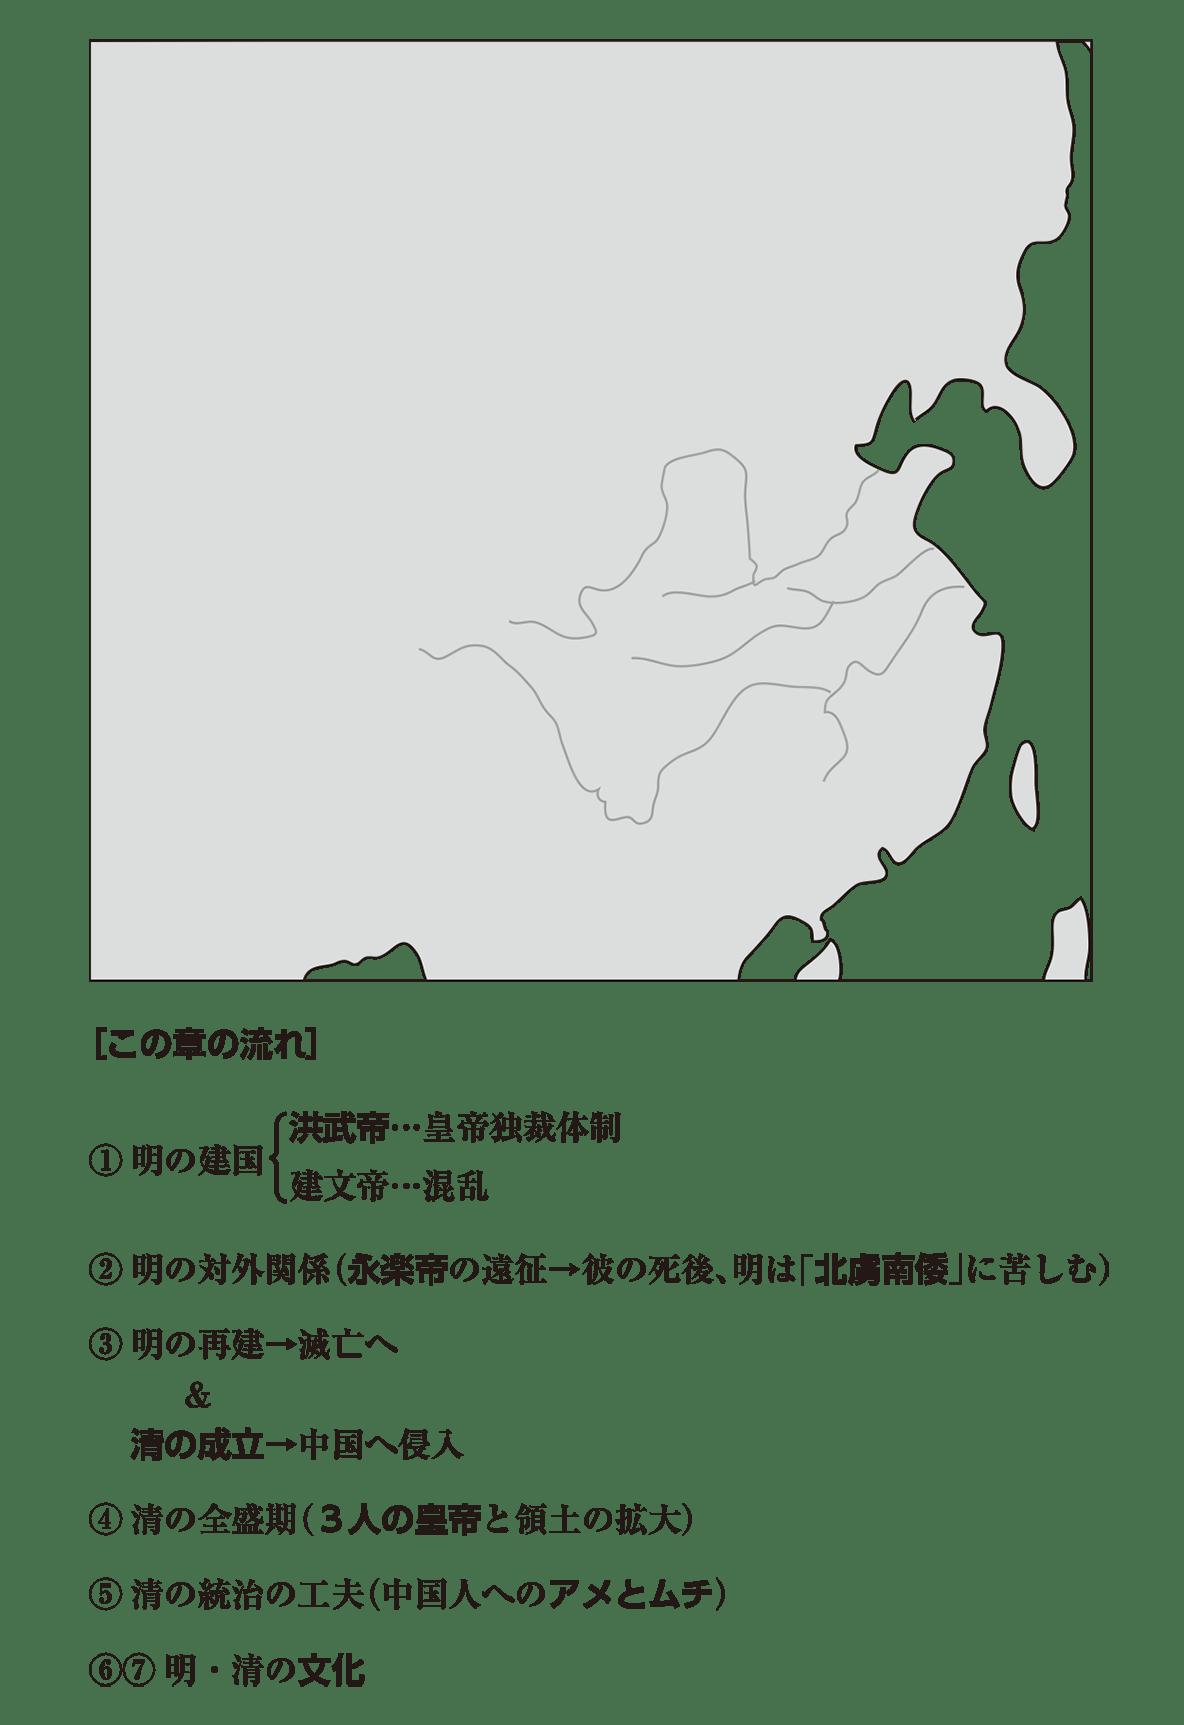 高校世界史 明・清の時代0 右頁地図+下部テキスト